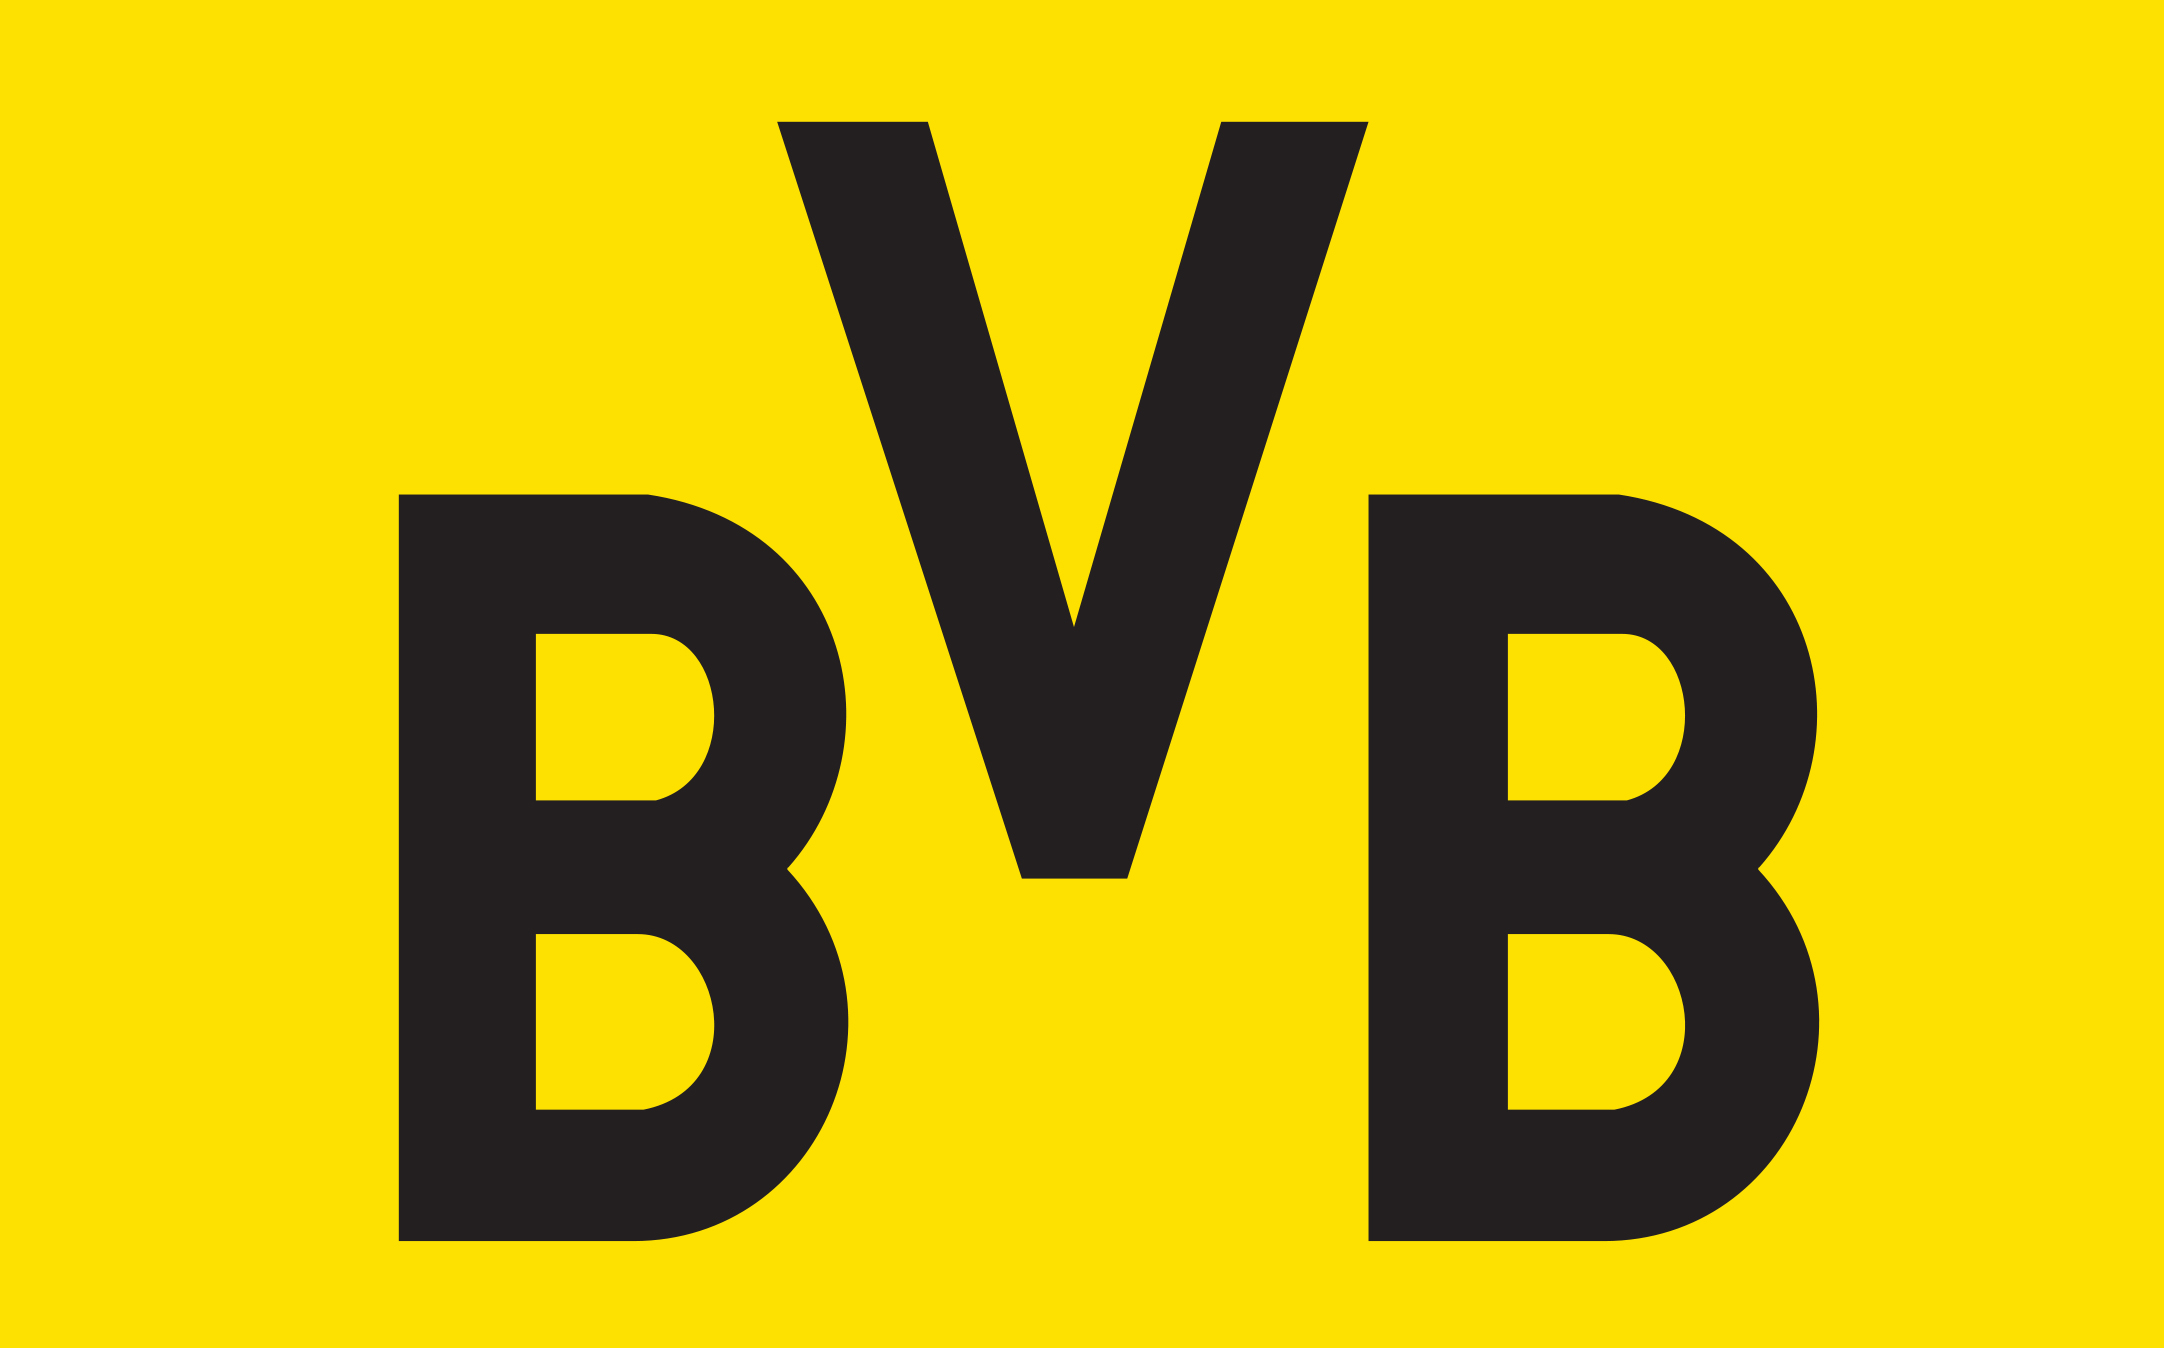 Bvb Symbol